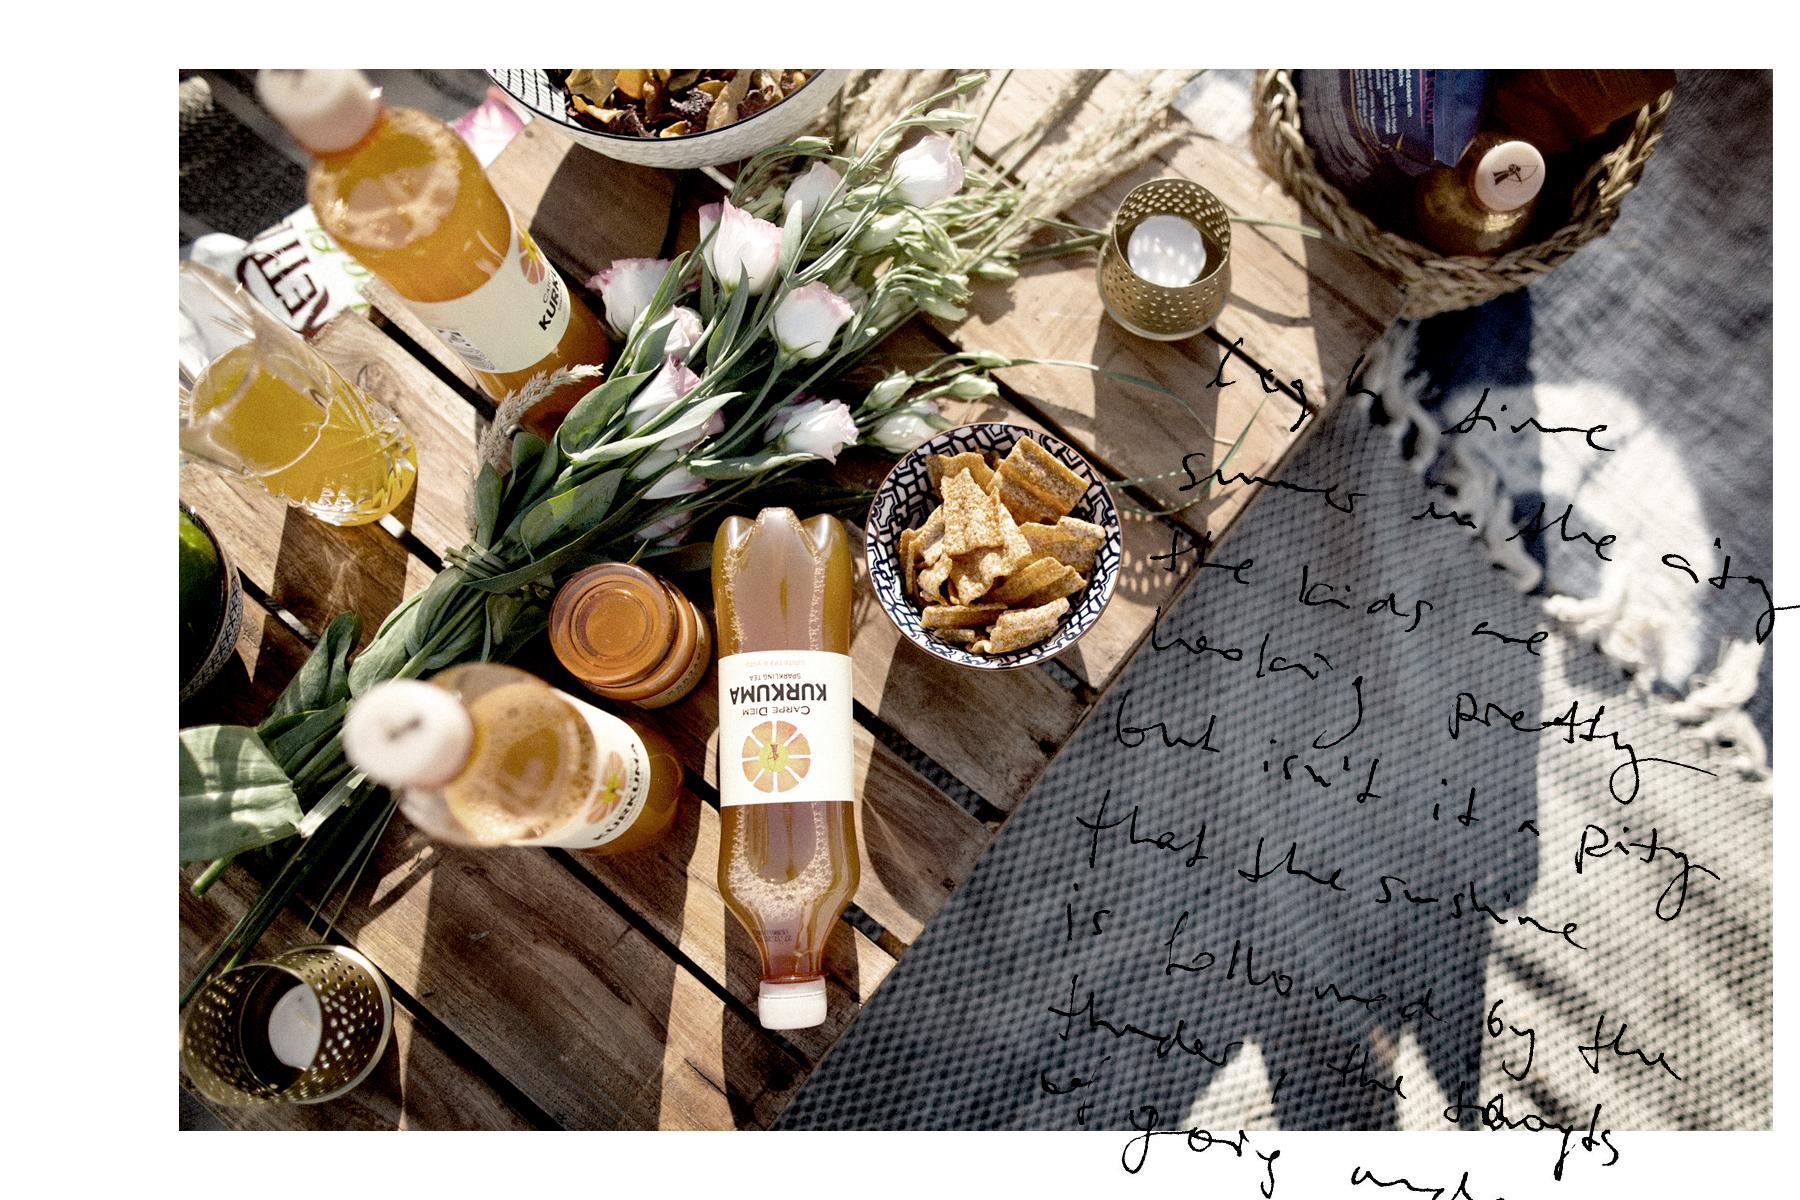 carpe diem kombucha kurkuma picknick summer beach getaway moroccan marokkanisch design style friends chill relax kettle chips food snack lifestyle lifestyleblogger fashionblogger modeblog düsseldorf cats & dogs ricarda schernus max bechmann 3